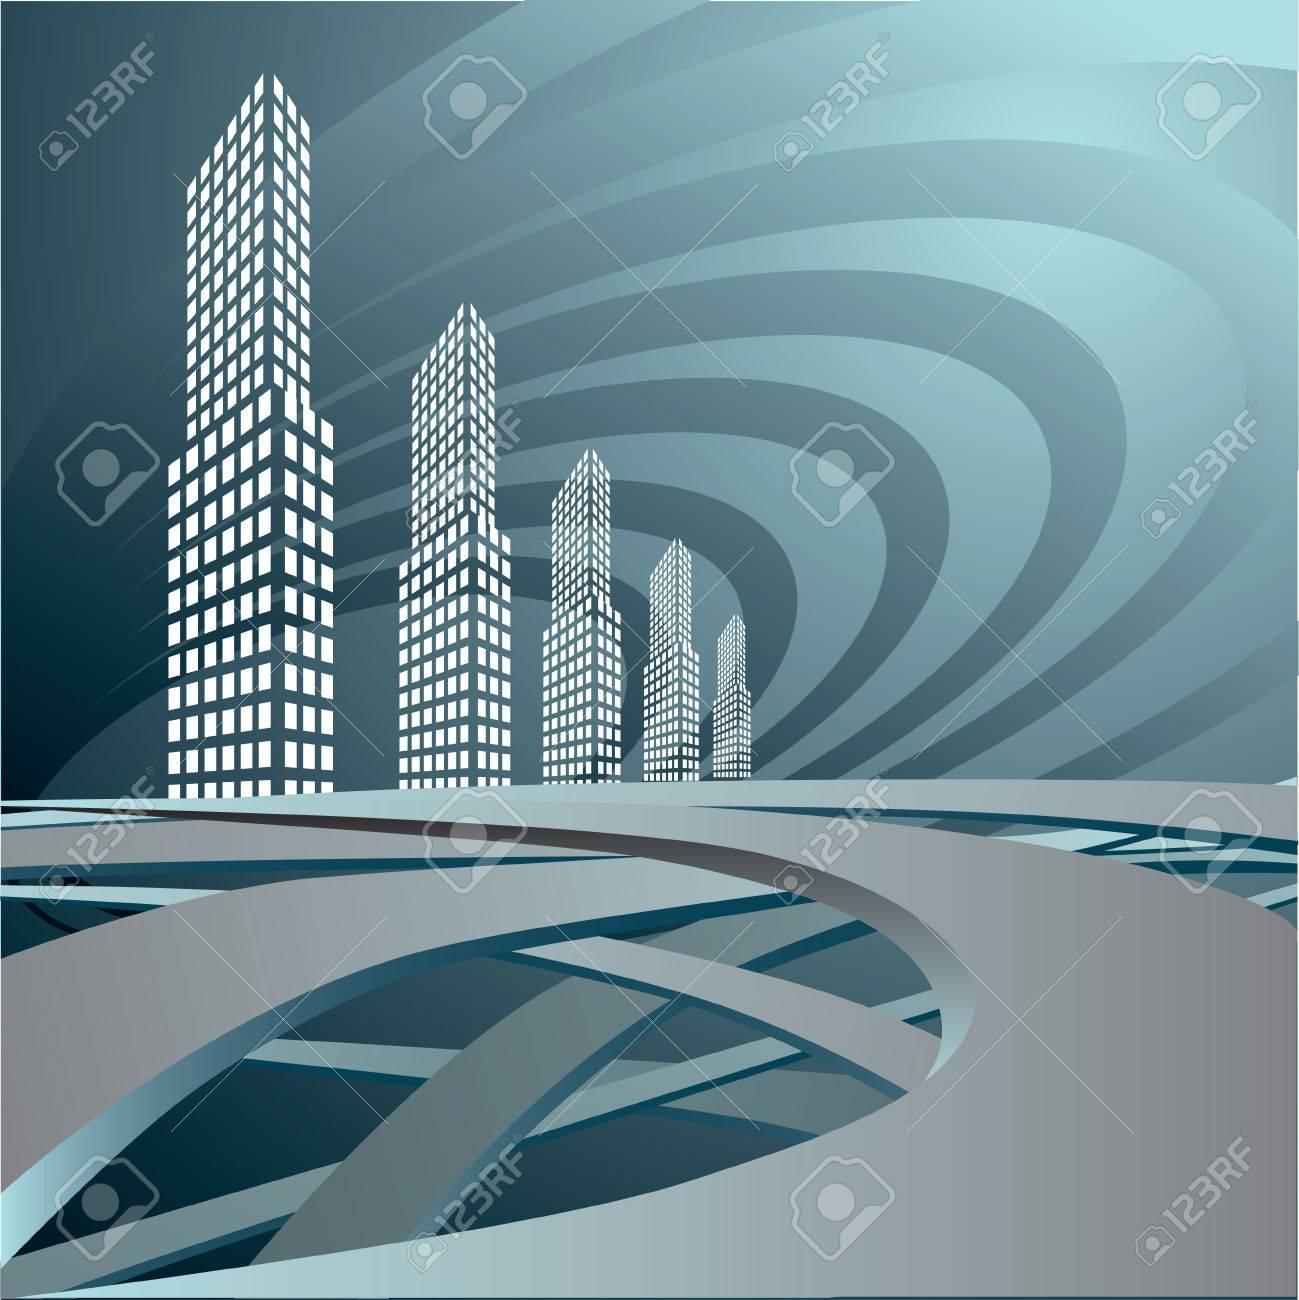 The city landscape. Stock Vector - 6605689